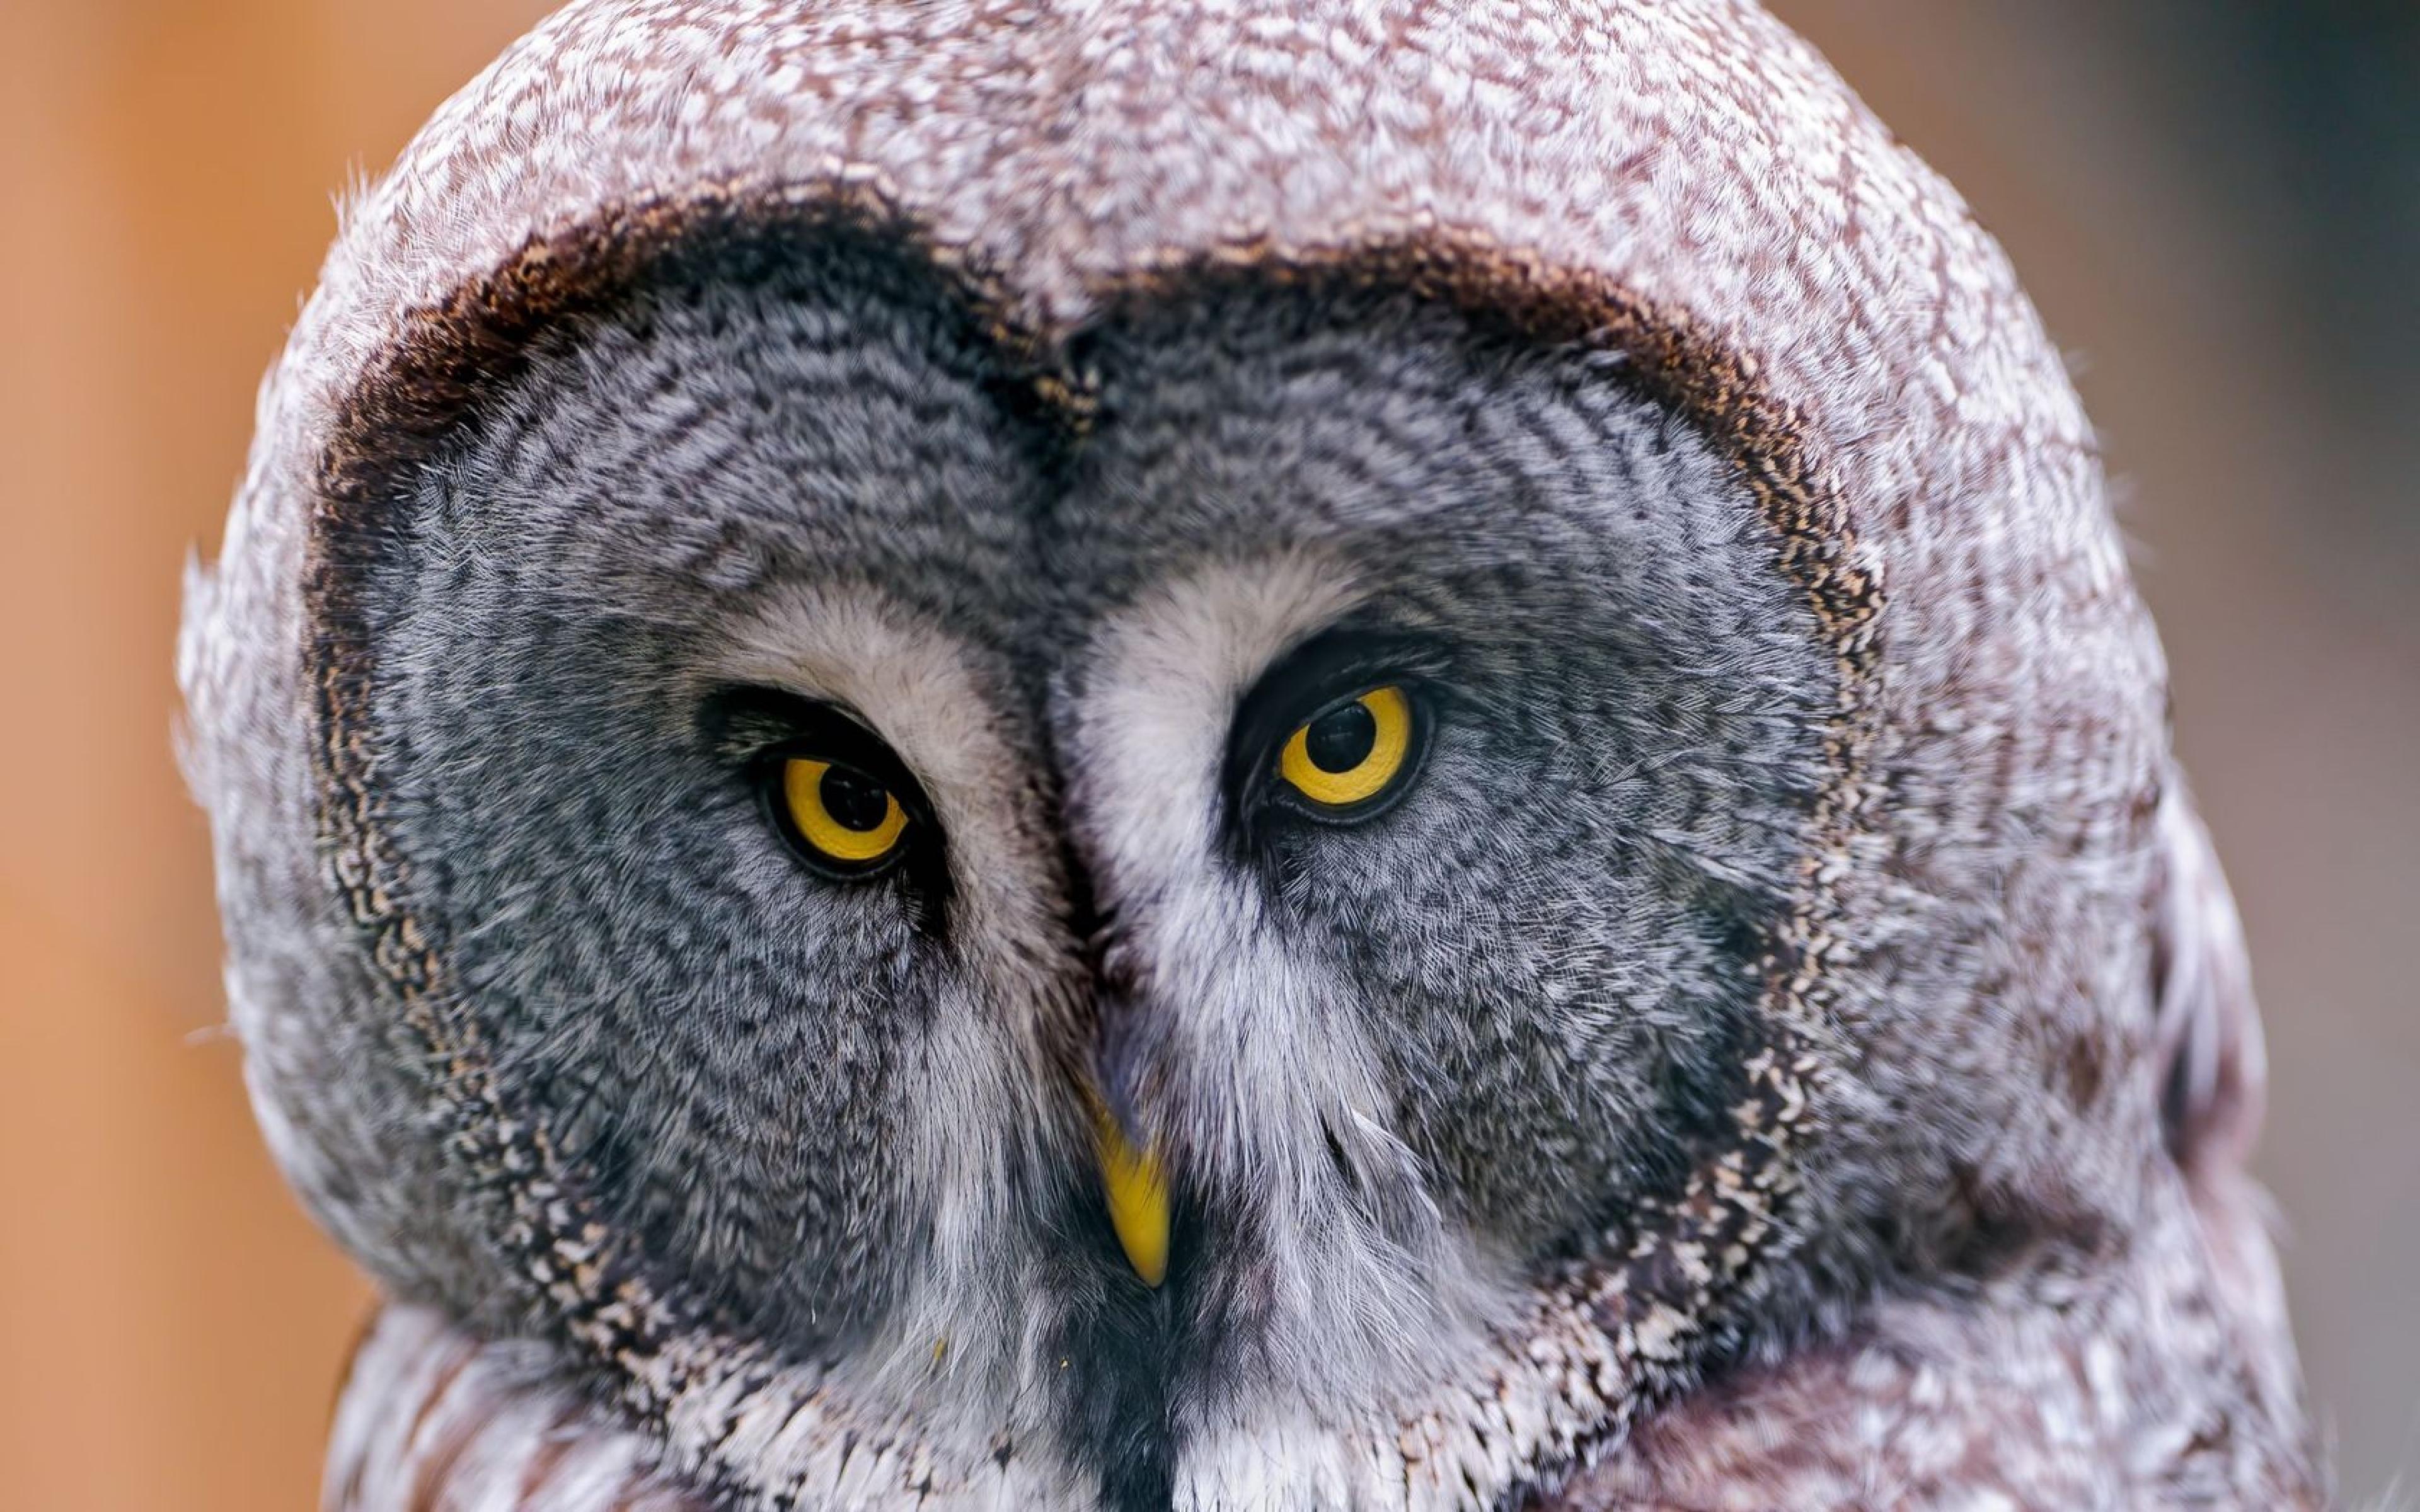 41+ 4K Owl Wallpaper on WallpaperSafari